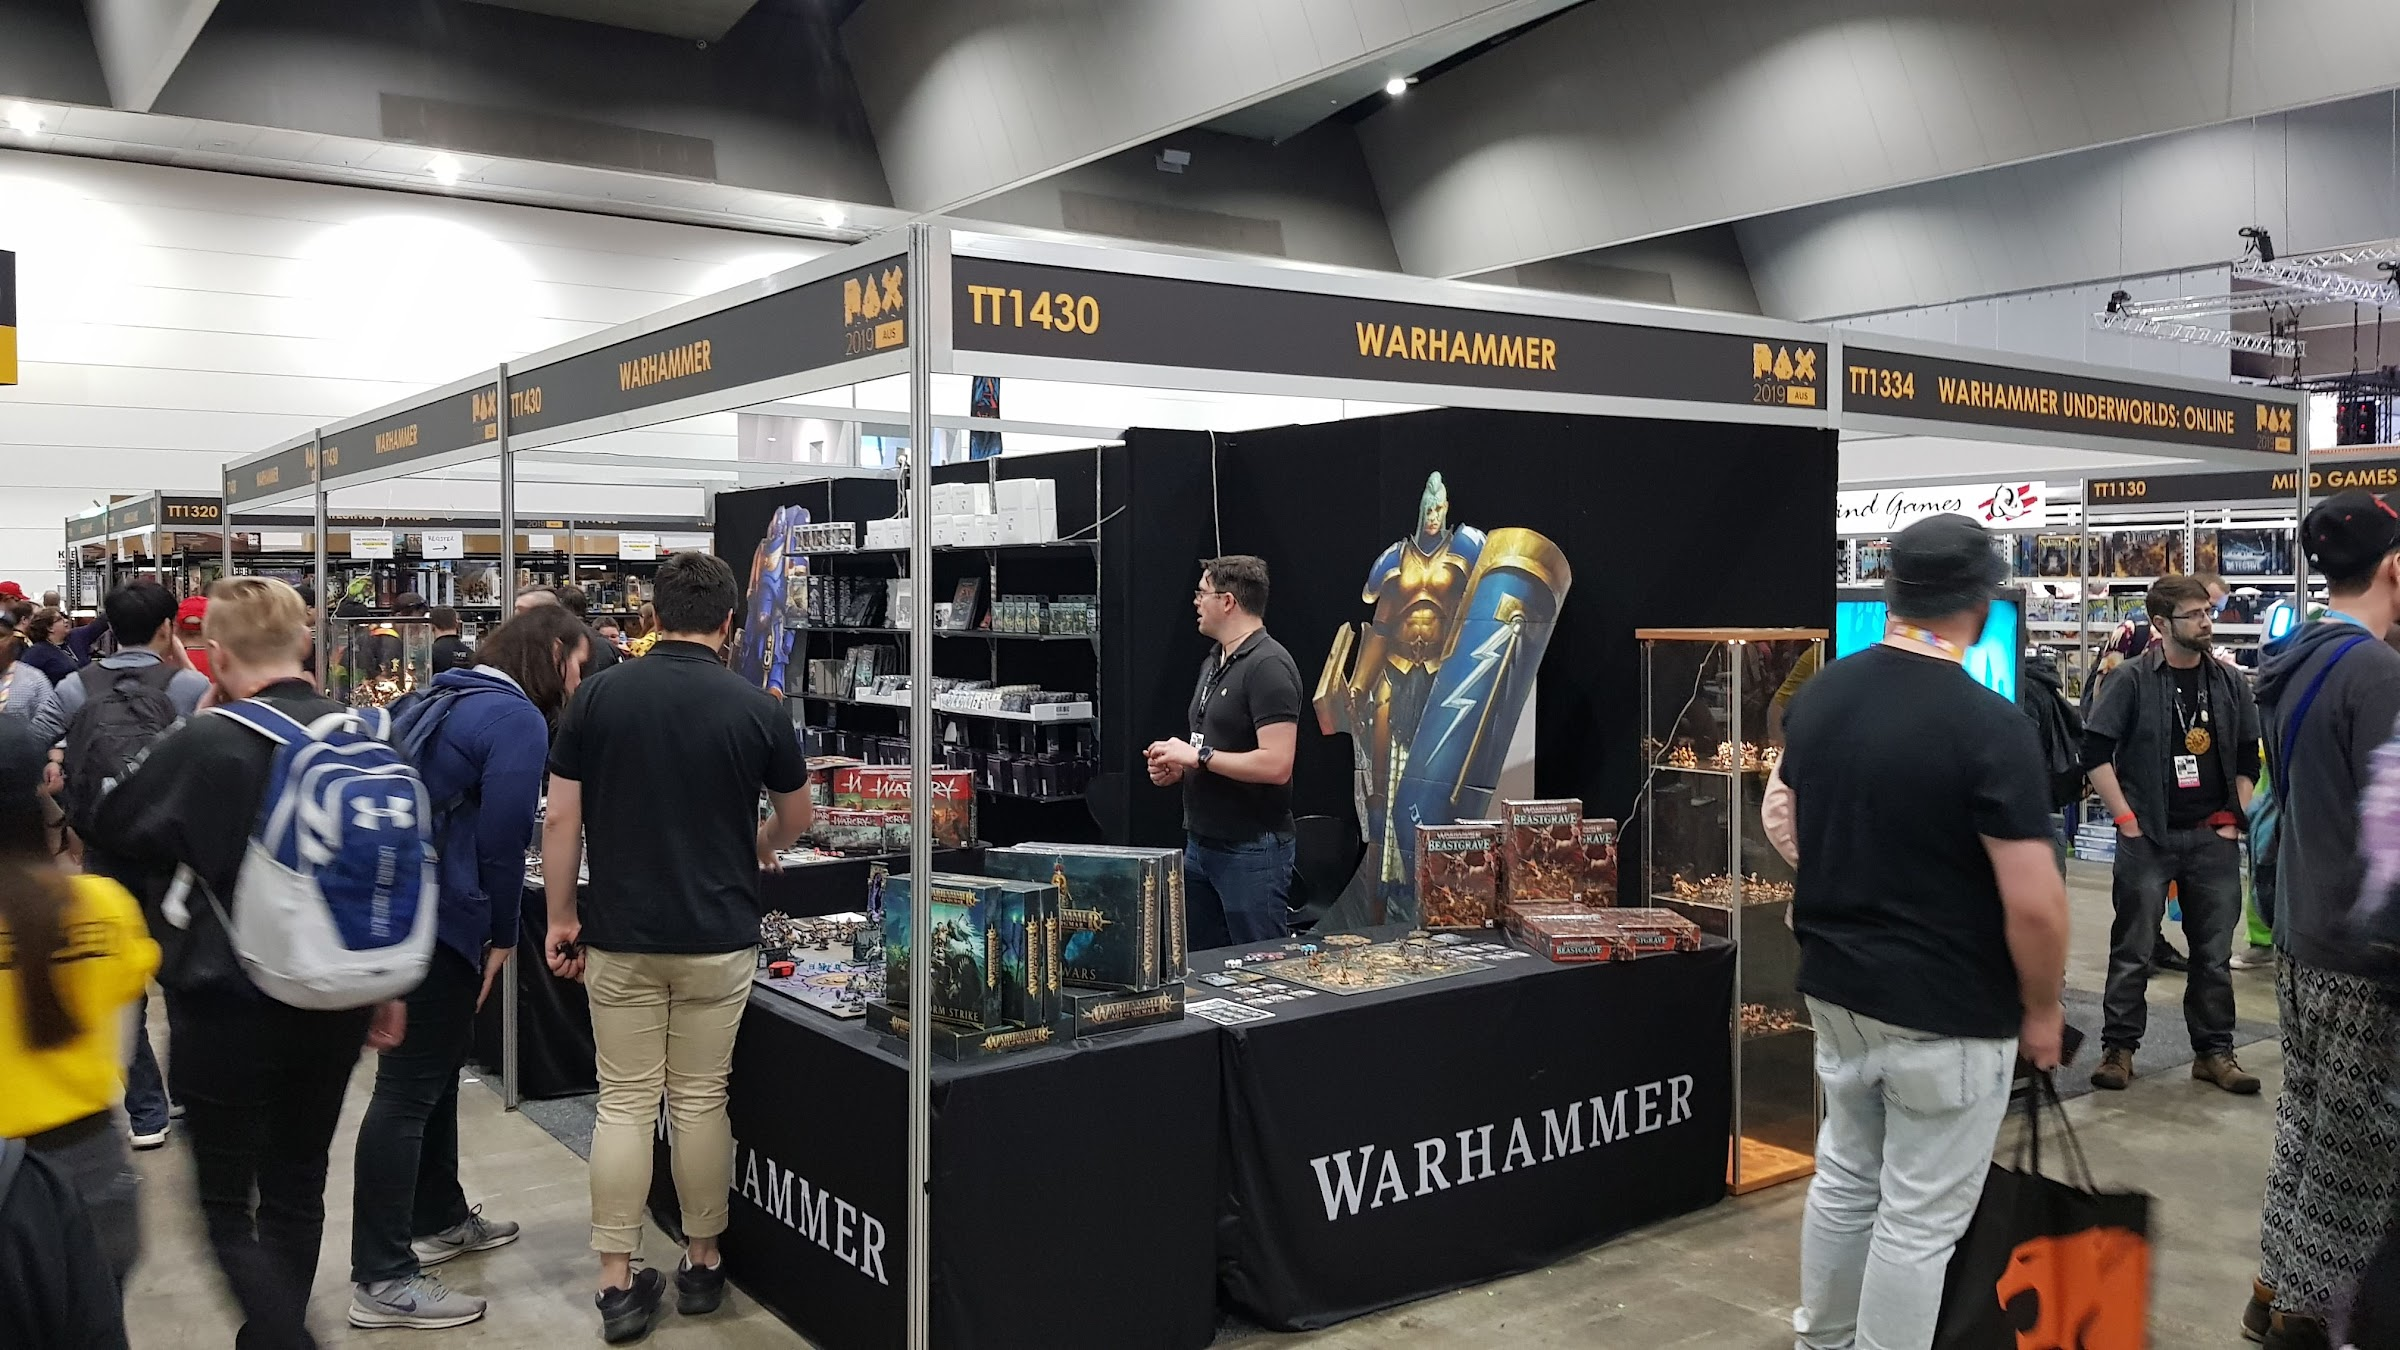 Warhammer stand at PAX 2019